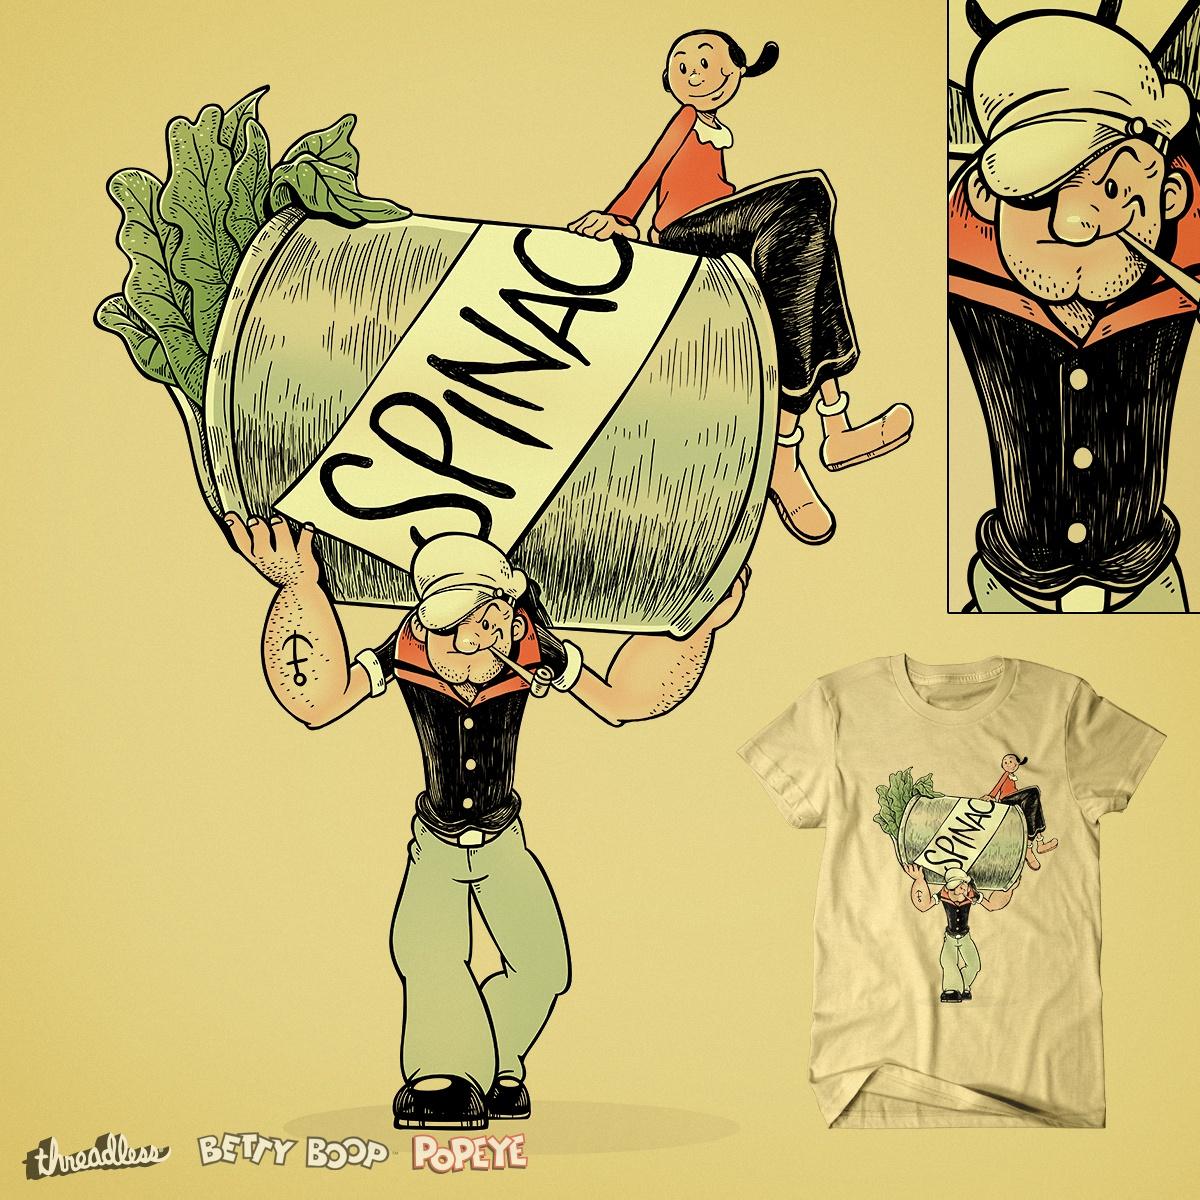 Popeye and Betty Boop. Shop the winning designs! | Threadless